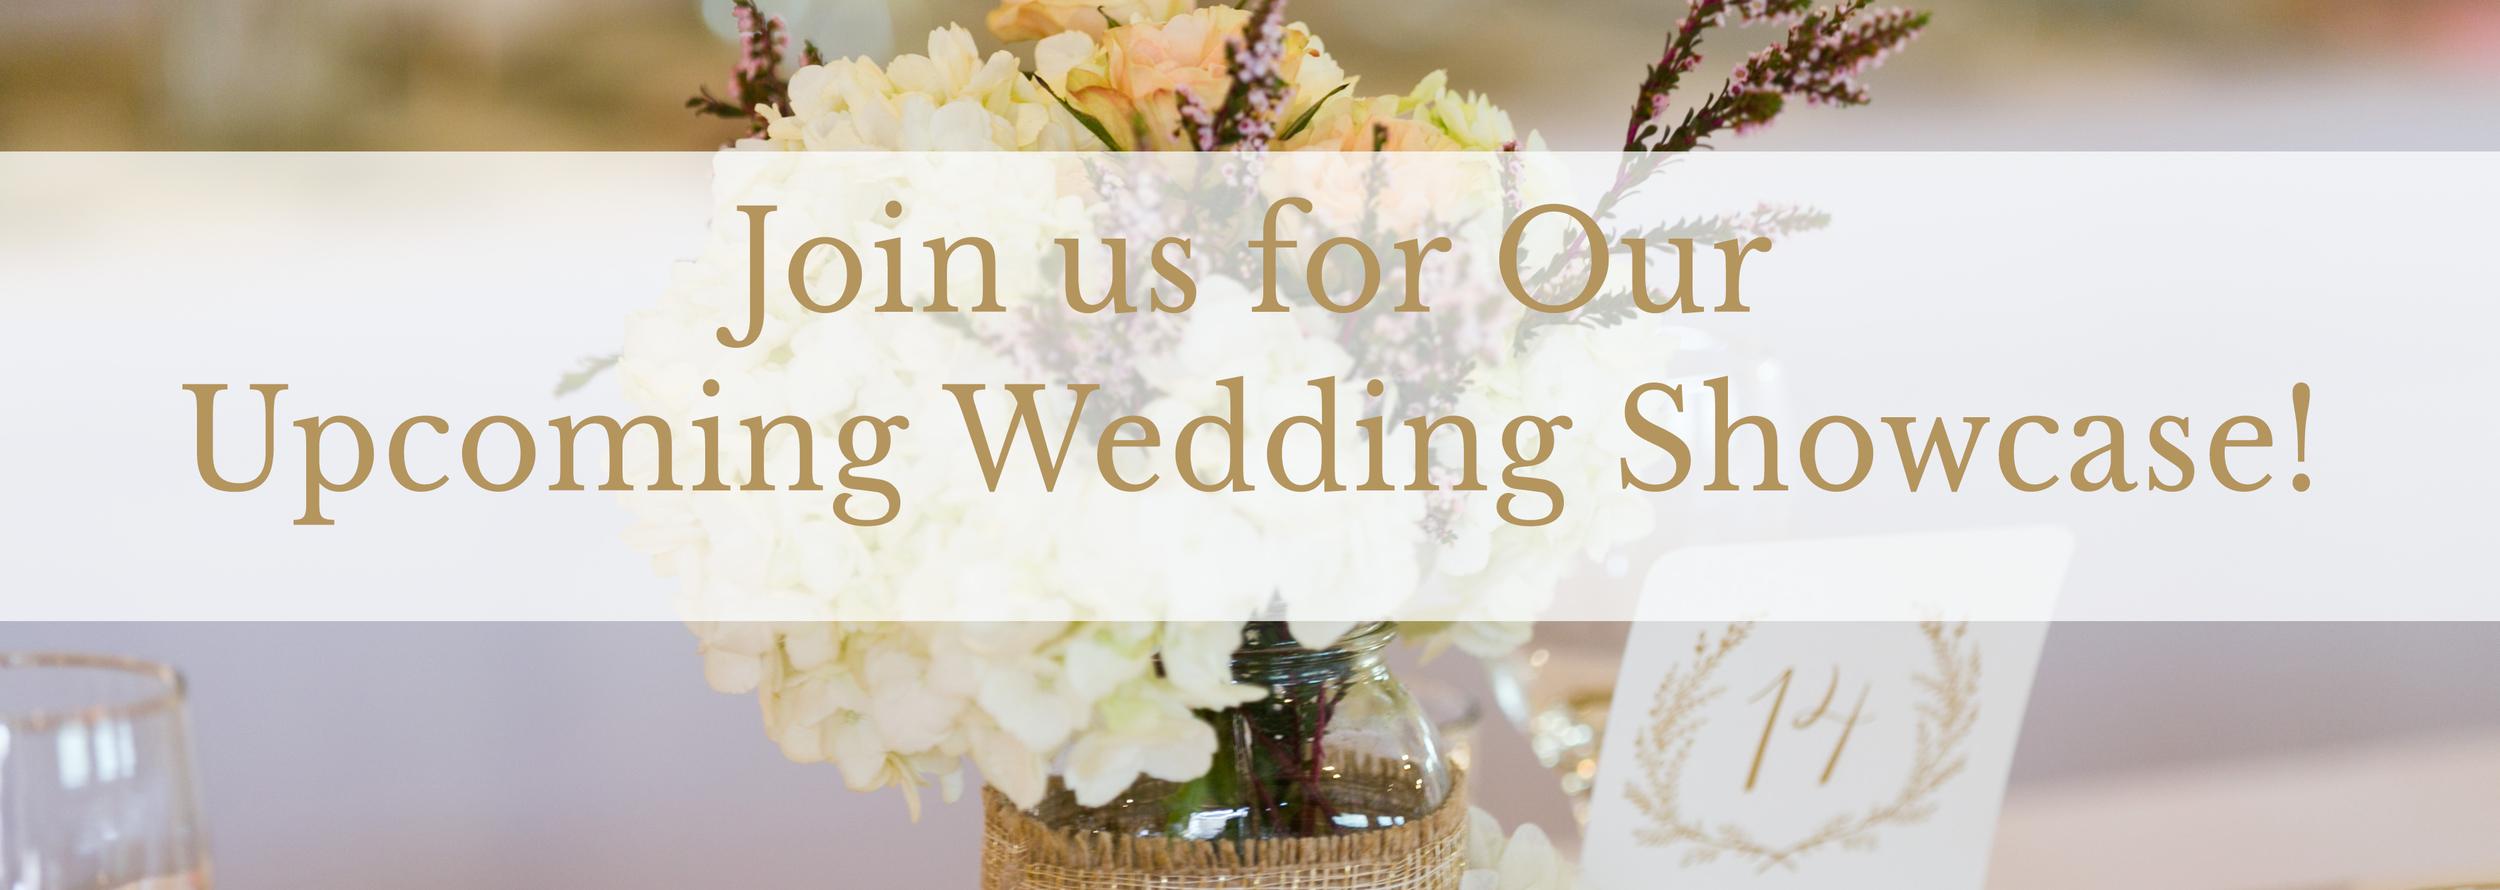 Wedding showcase header.jpg